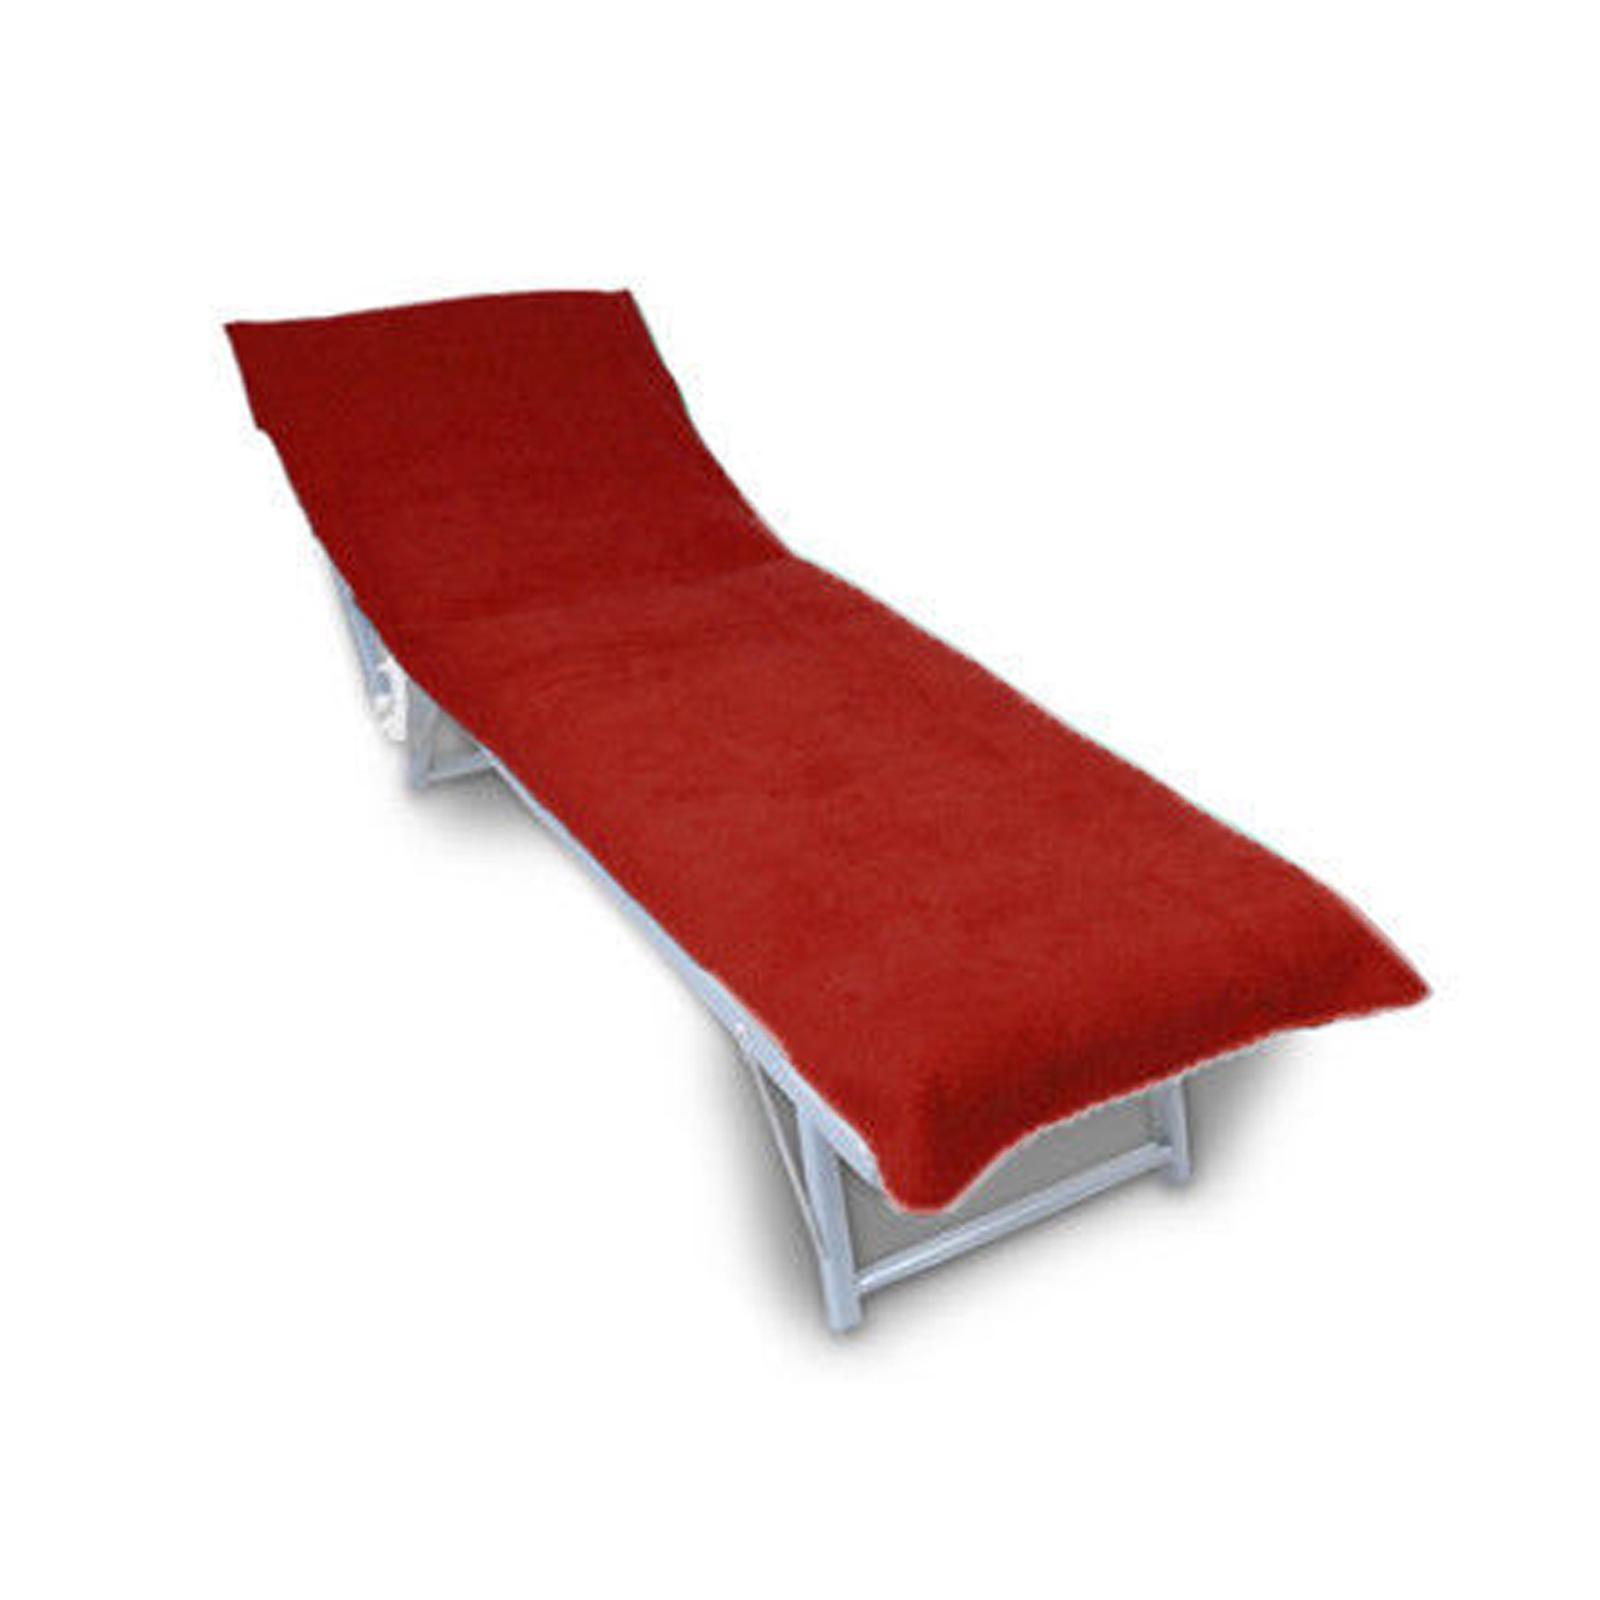 tissu ponge housse pour transat pour jardin r f rence. Black Bedroom Furniture Sets. Home Design Ideas